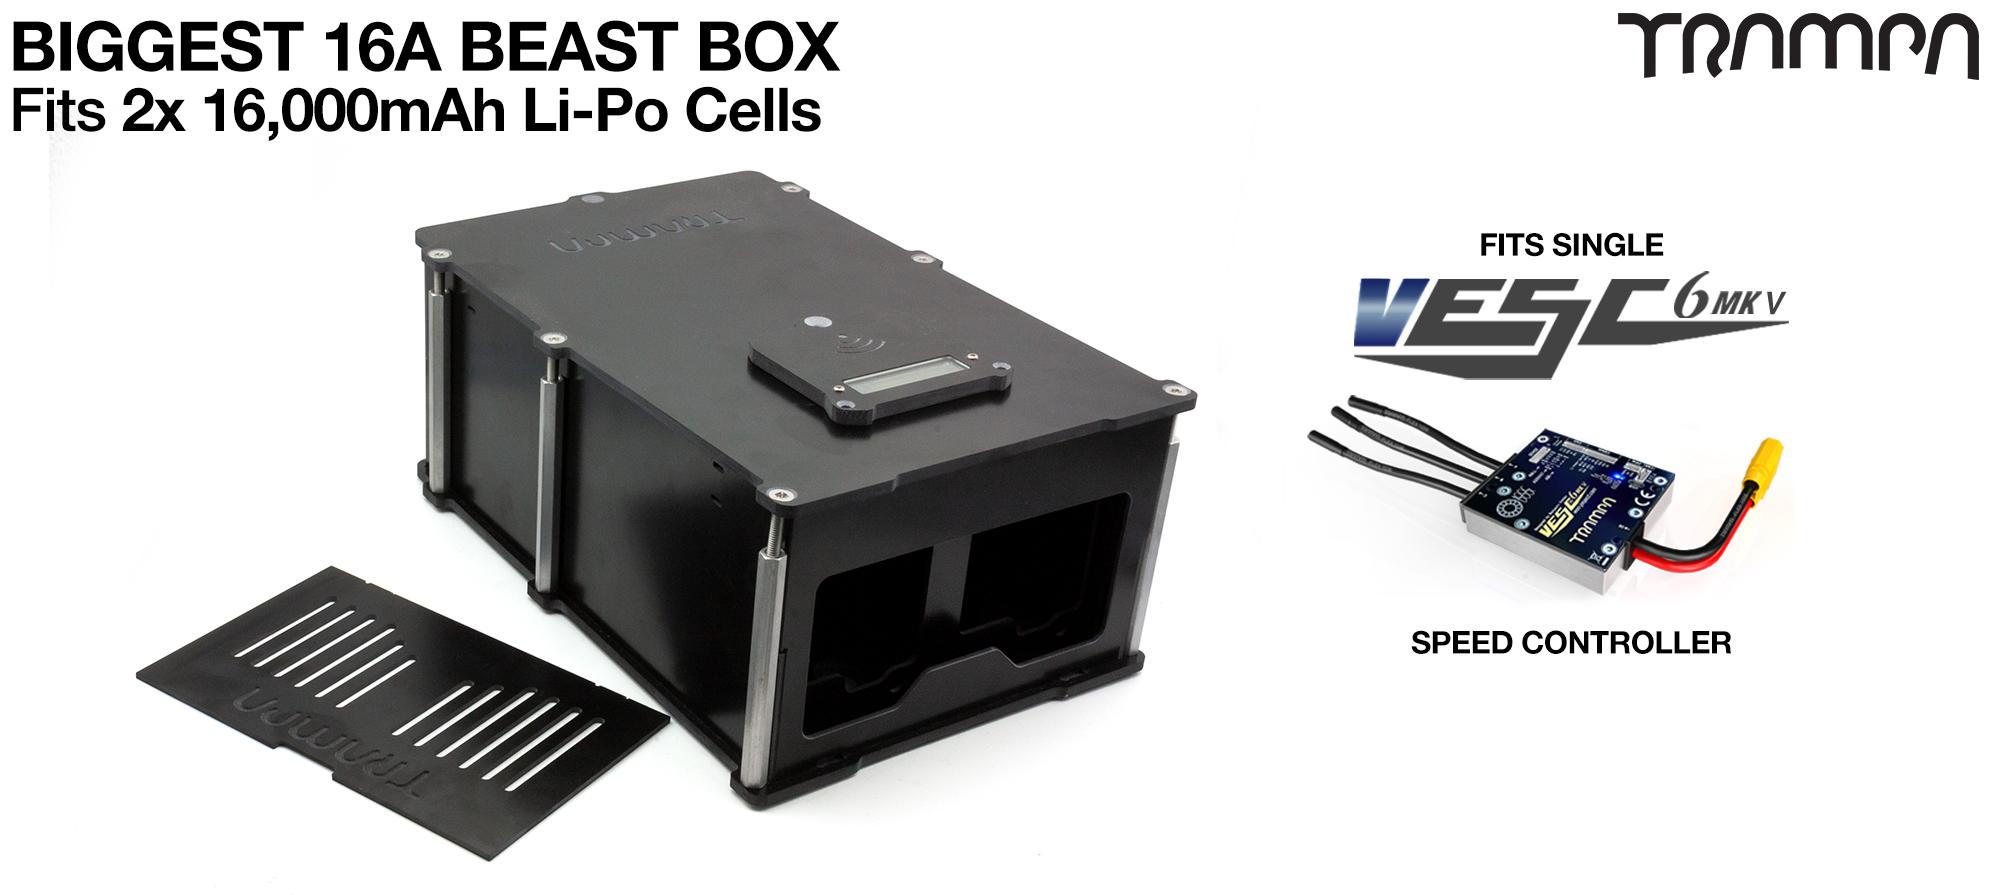 BEAST Box to fit 2x 6s 16000 mAh cells with Internal VESC Housing - Single Motor